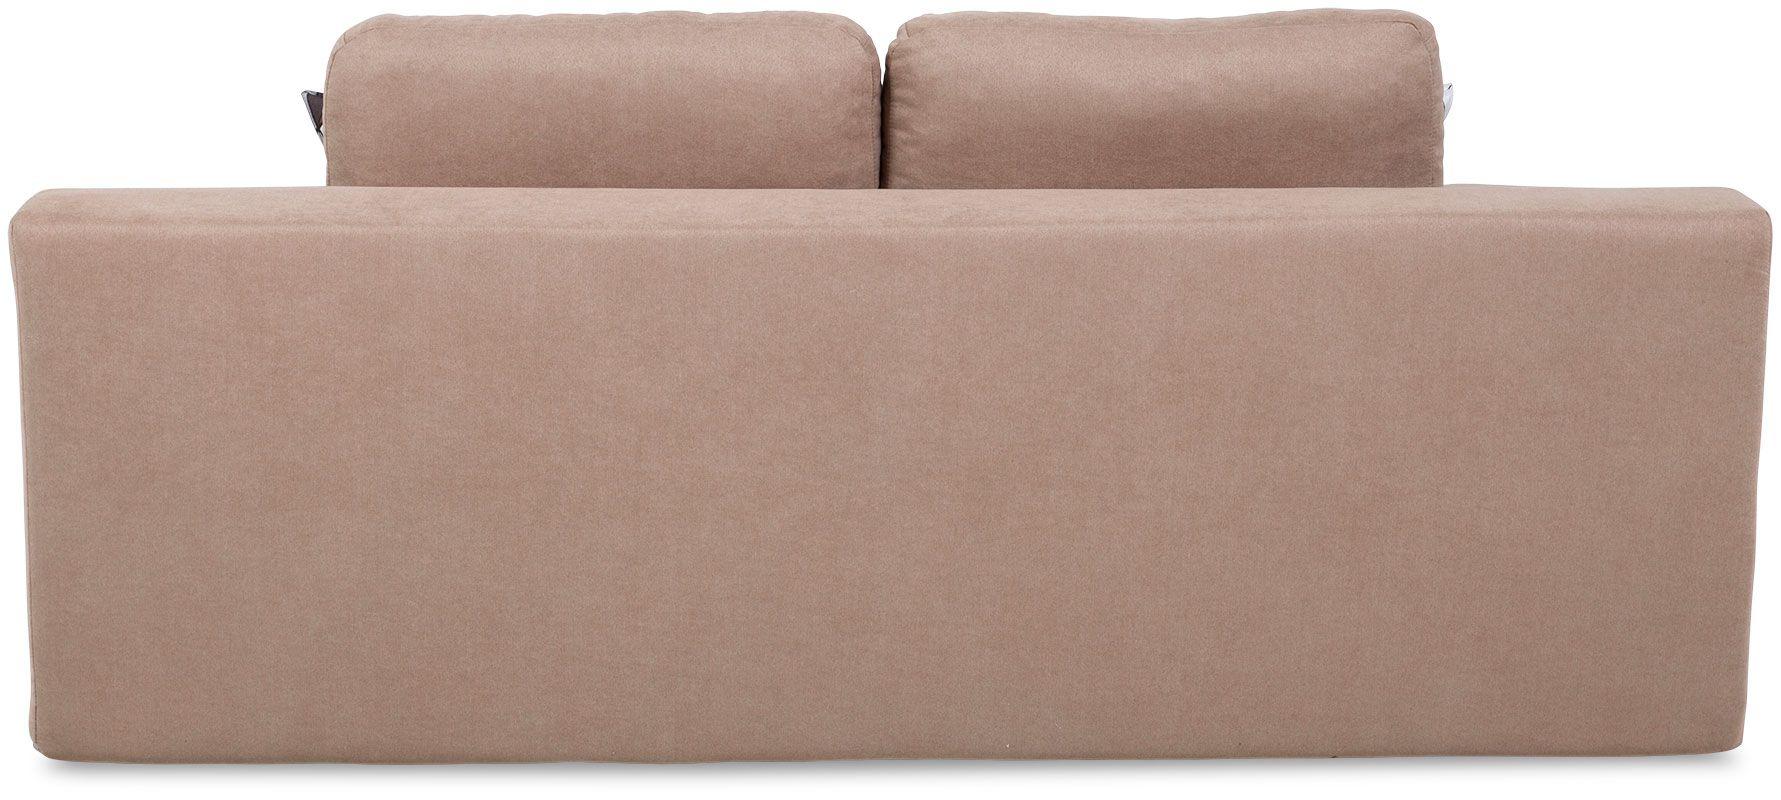 kanapa nela bezowa  6